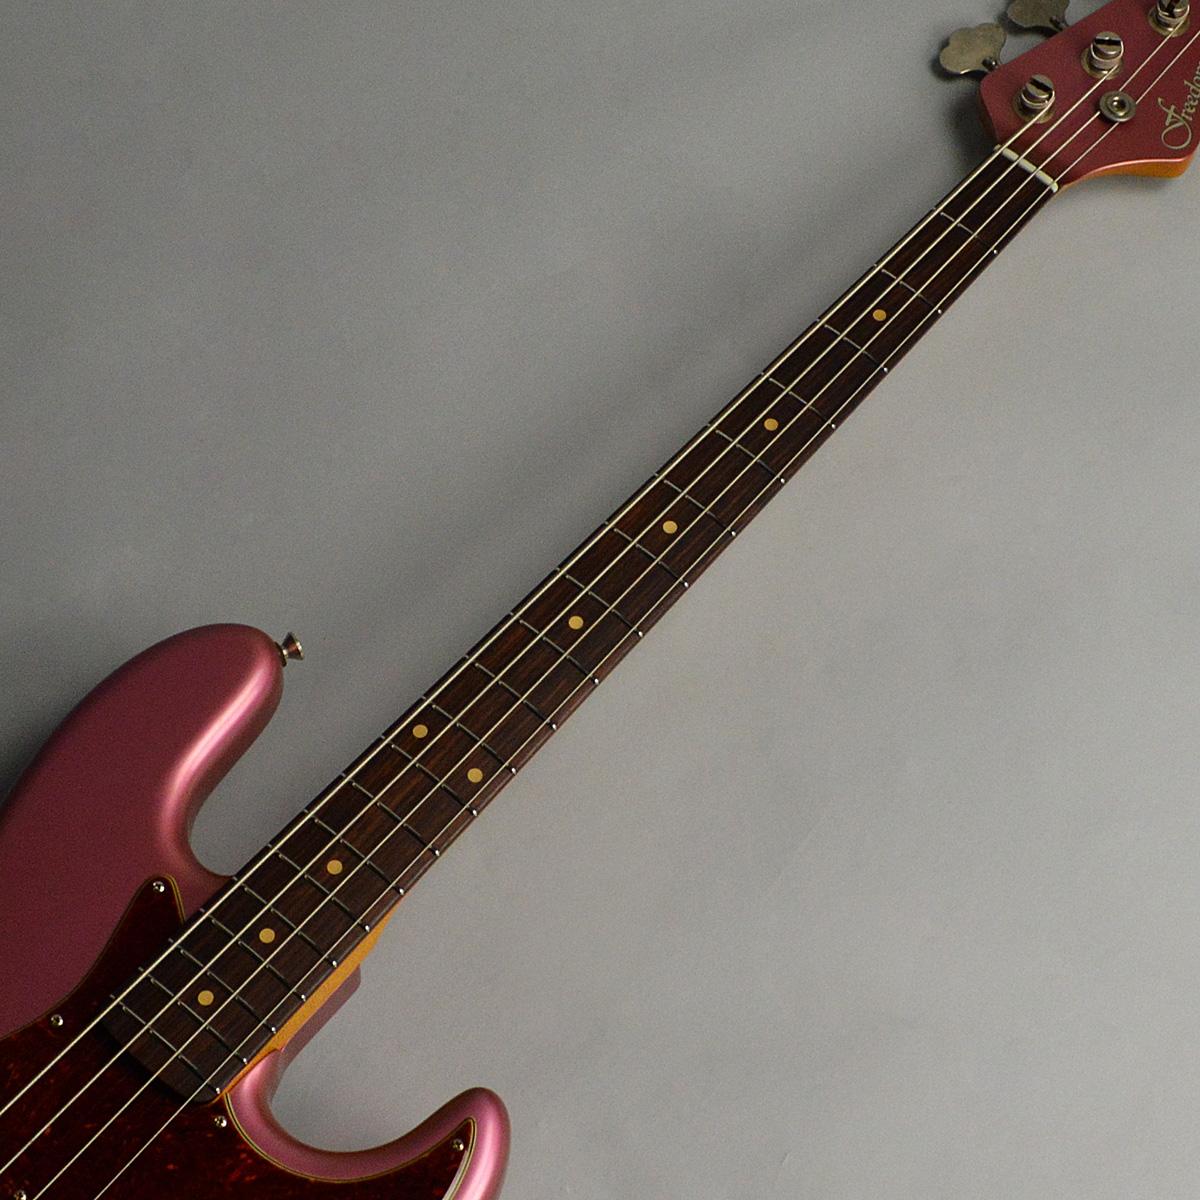 RSJB / Retro Spective Jazz Bassの指板画像